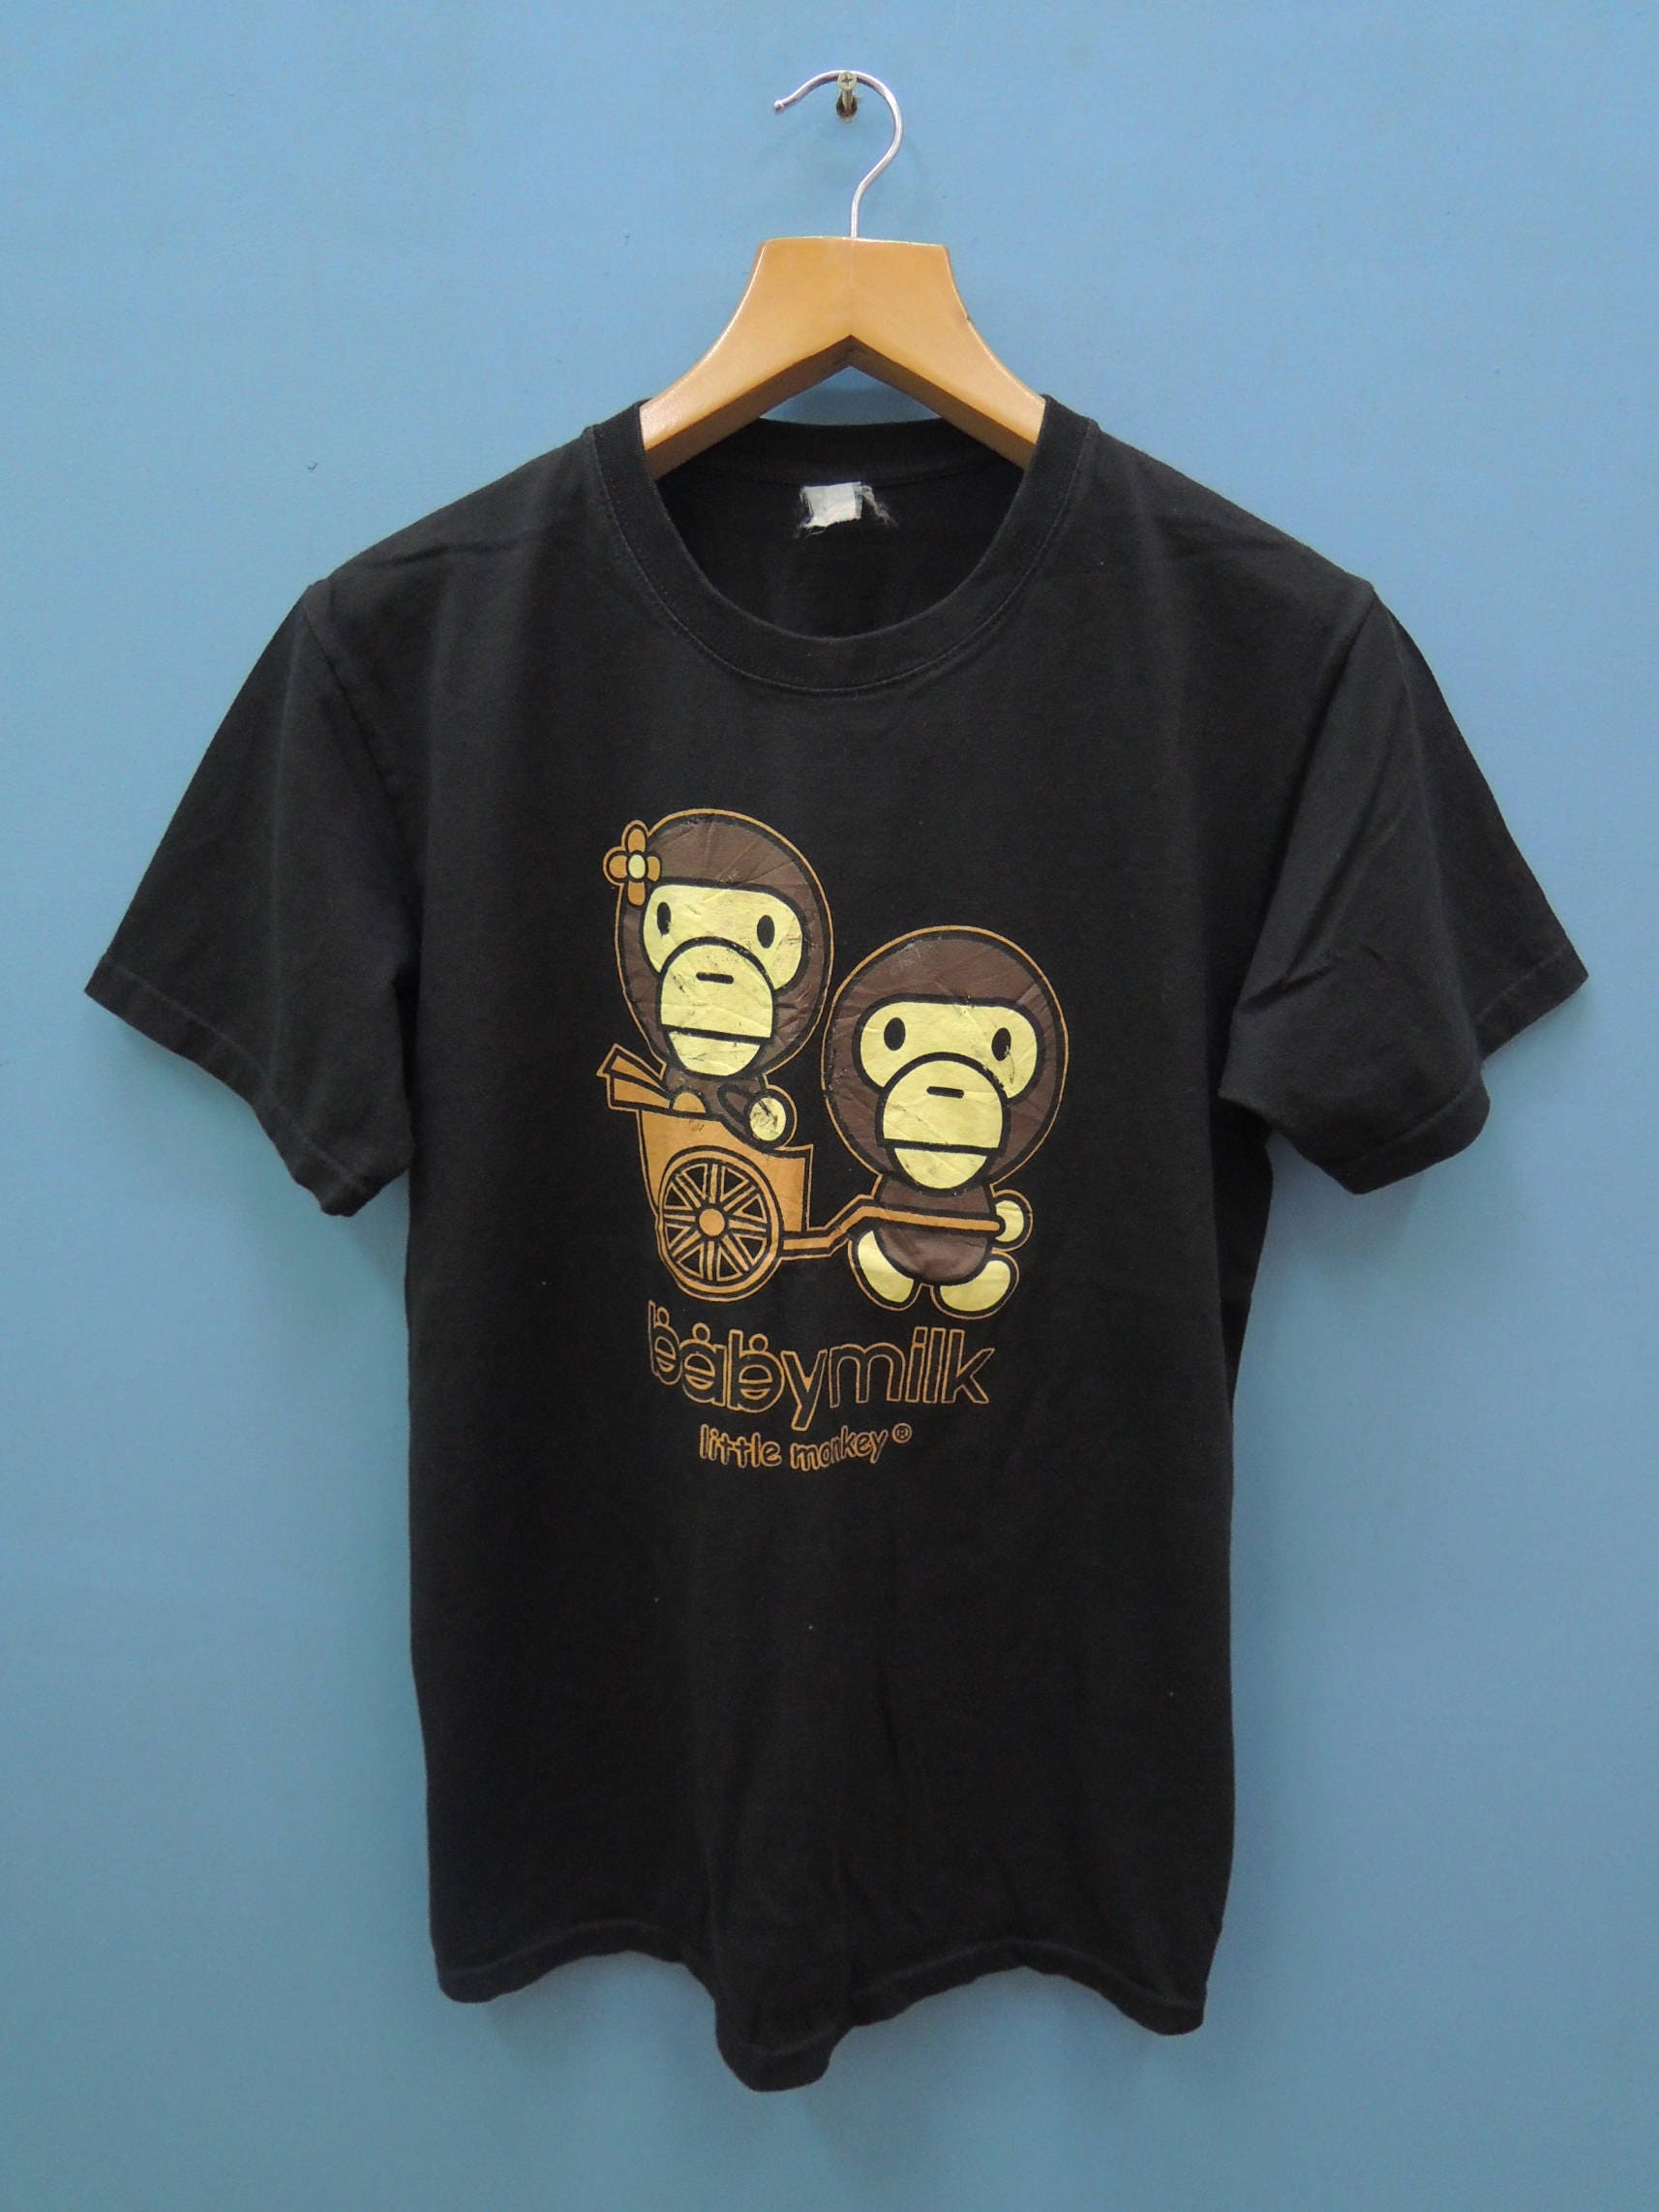 b29e03742 Vintage Bathing Ape Baby Milo Street Wear Shirt Top Tee Skate | Etsy